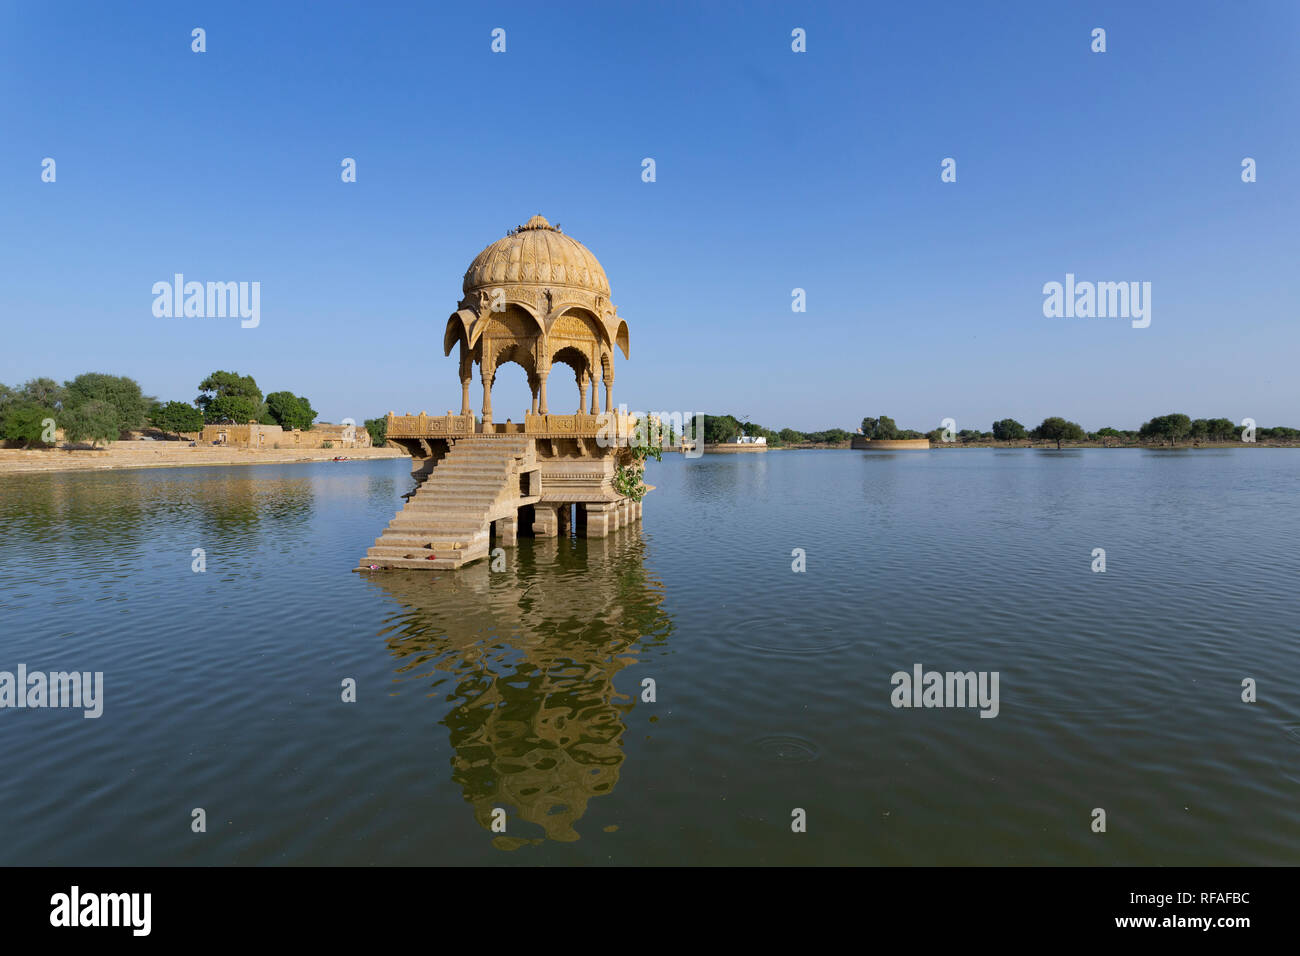 indian landmarks Gadi Sagar temple on Gadisar lake Jaisalmer, Rajasthan, north India Stock Photo